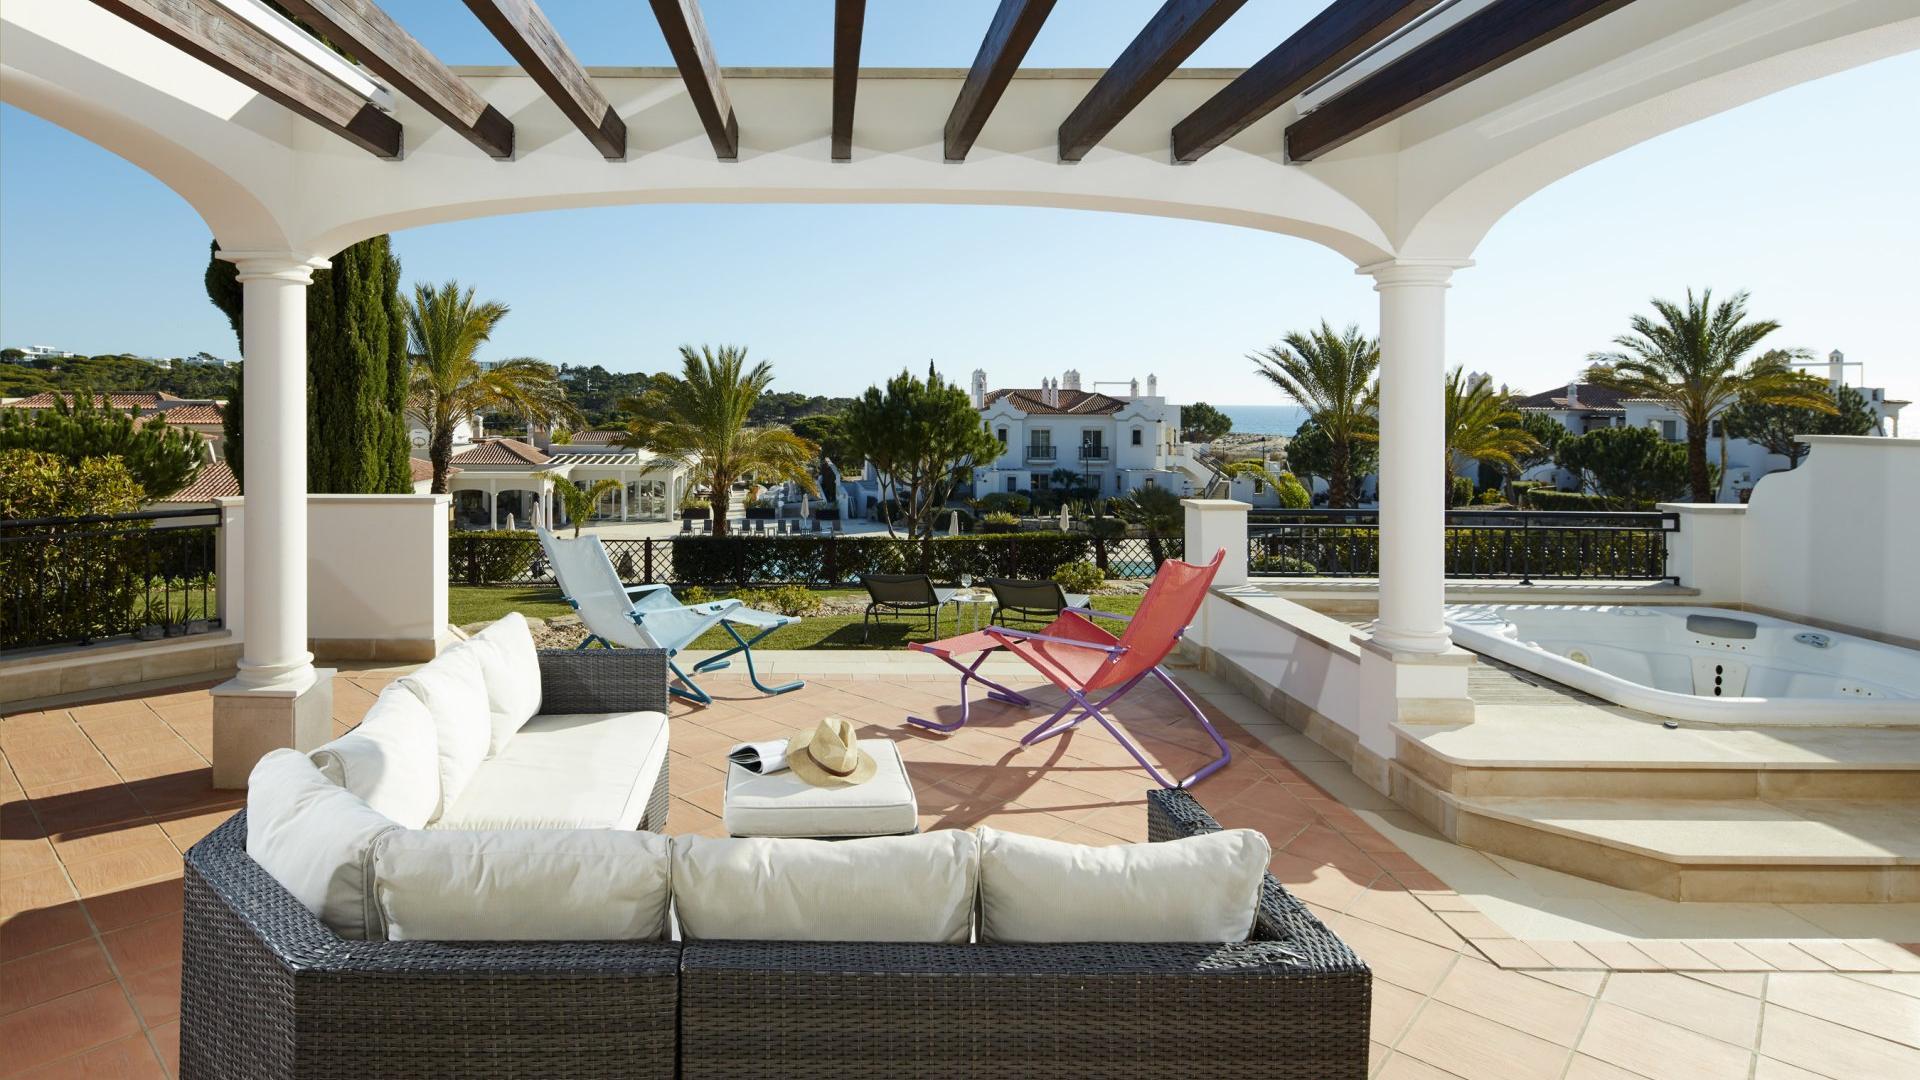 Dunas Douradas Beach Club Partial Sea View 2 bedroom Whirlpool Apartment - Dunas Douradas Beach Club, Vale do Lobo, Algarve - DDBC_X3A2597RN.jpg